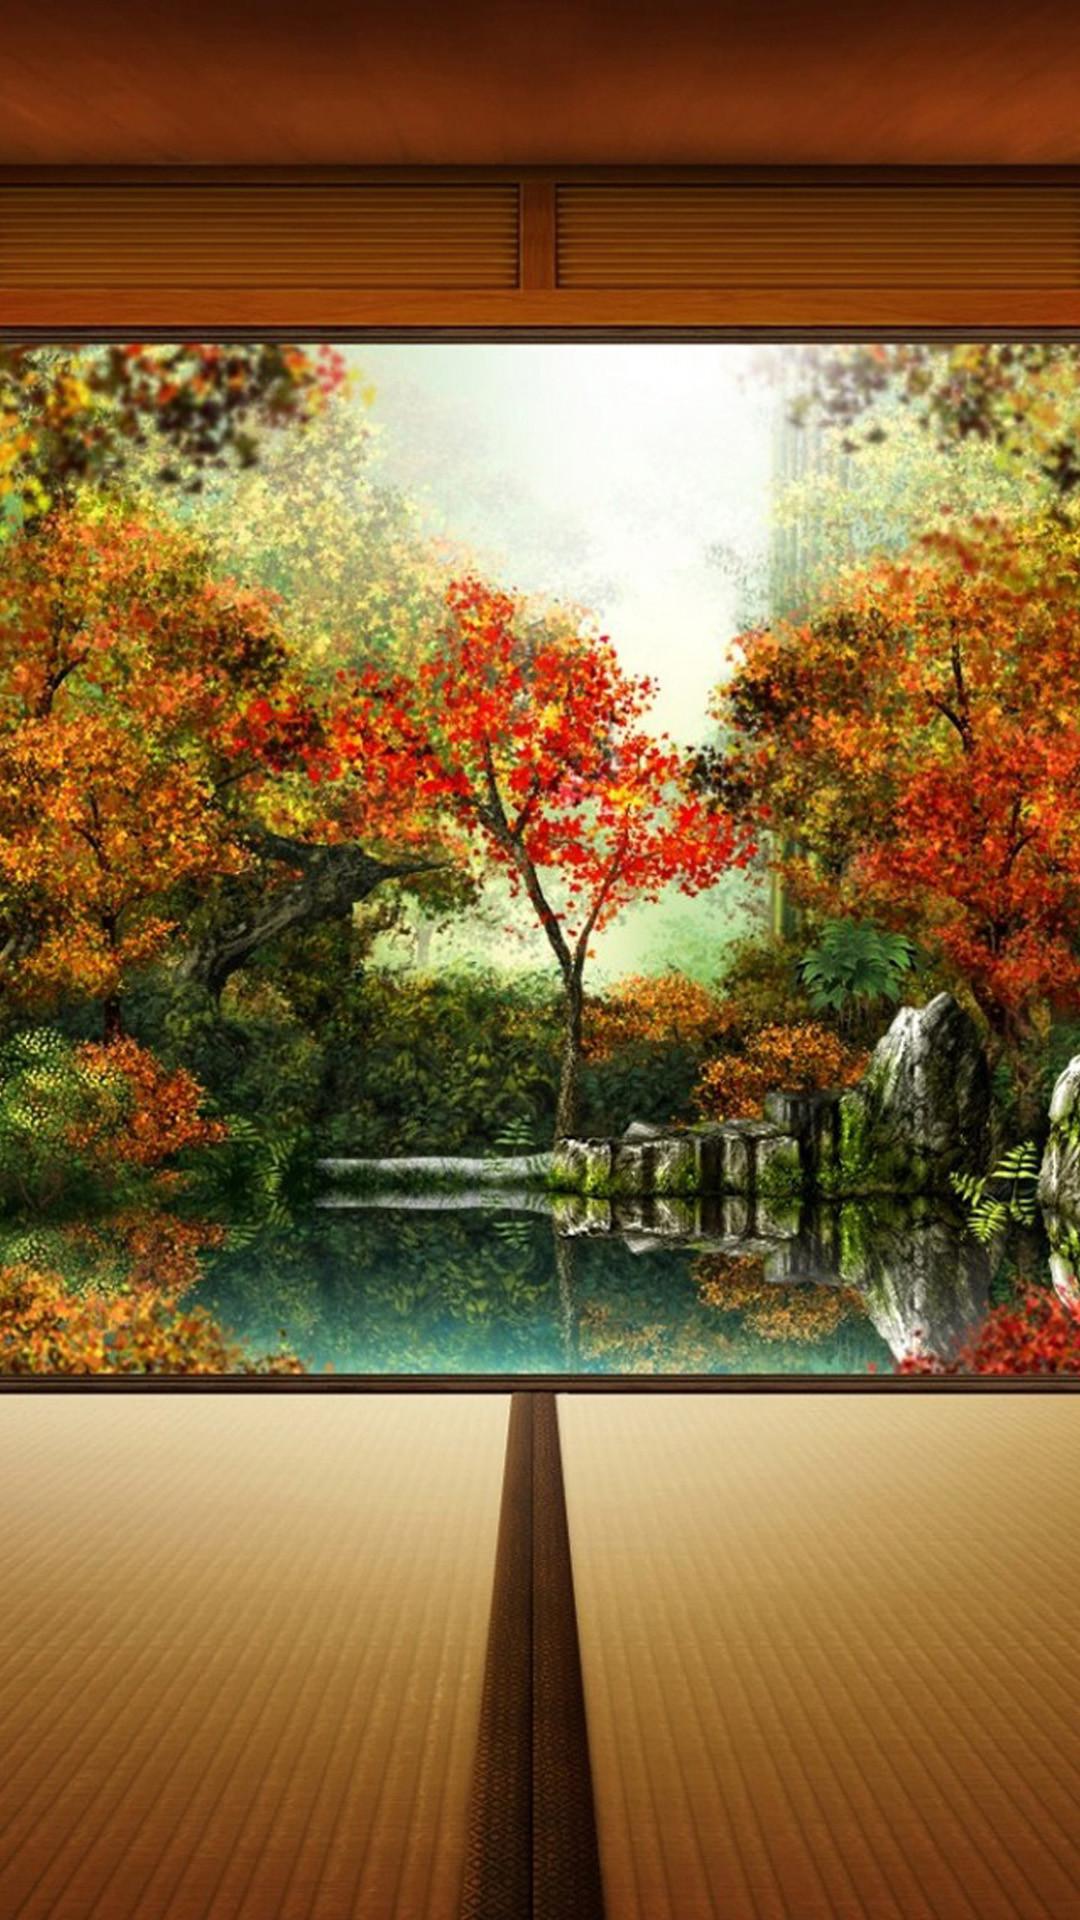 Autumn In Japan HD Wallpaper iPhone 6 plus